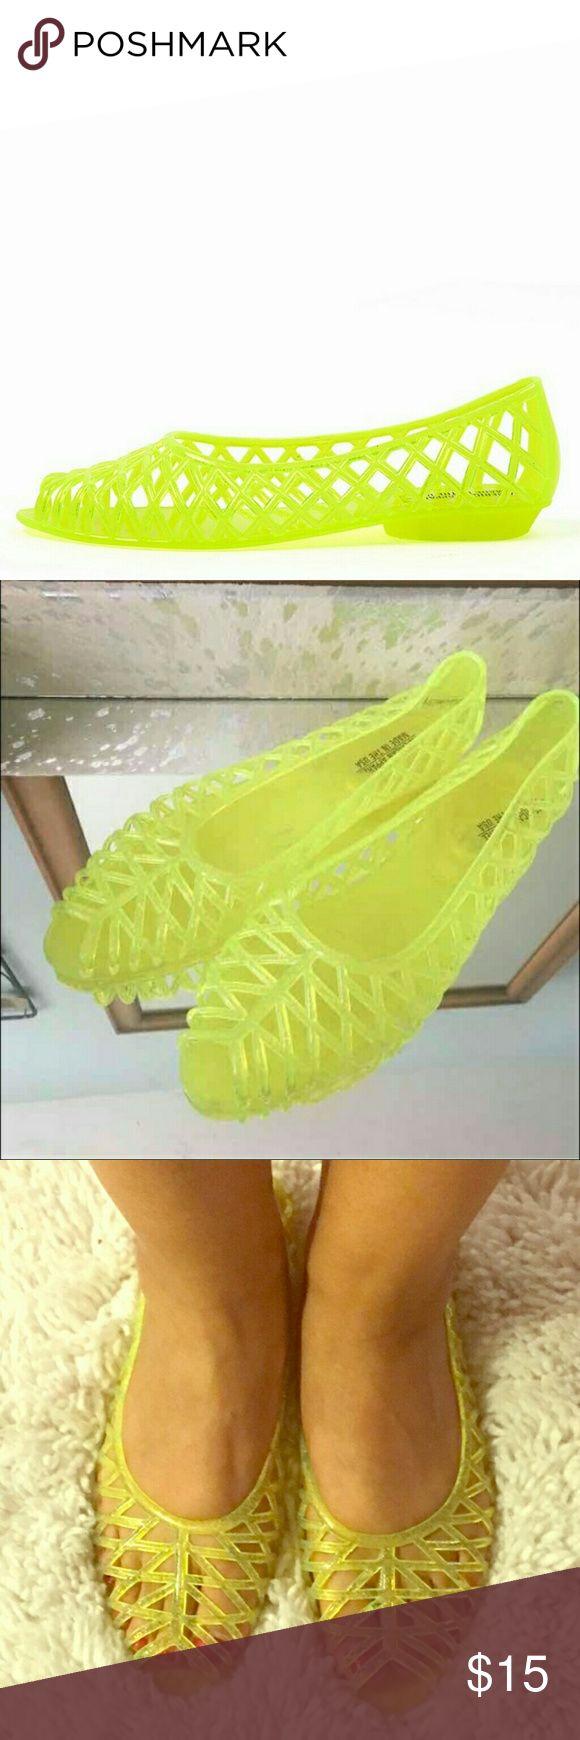 Black jelly sandals american apparel - Nwbag American Apparel Flat Lattice Jelly Sandal American Apparel Flat Lattice Jelly Sandal 24